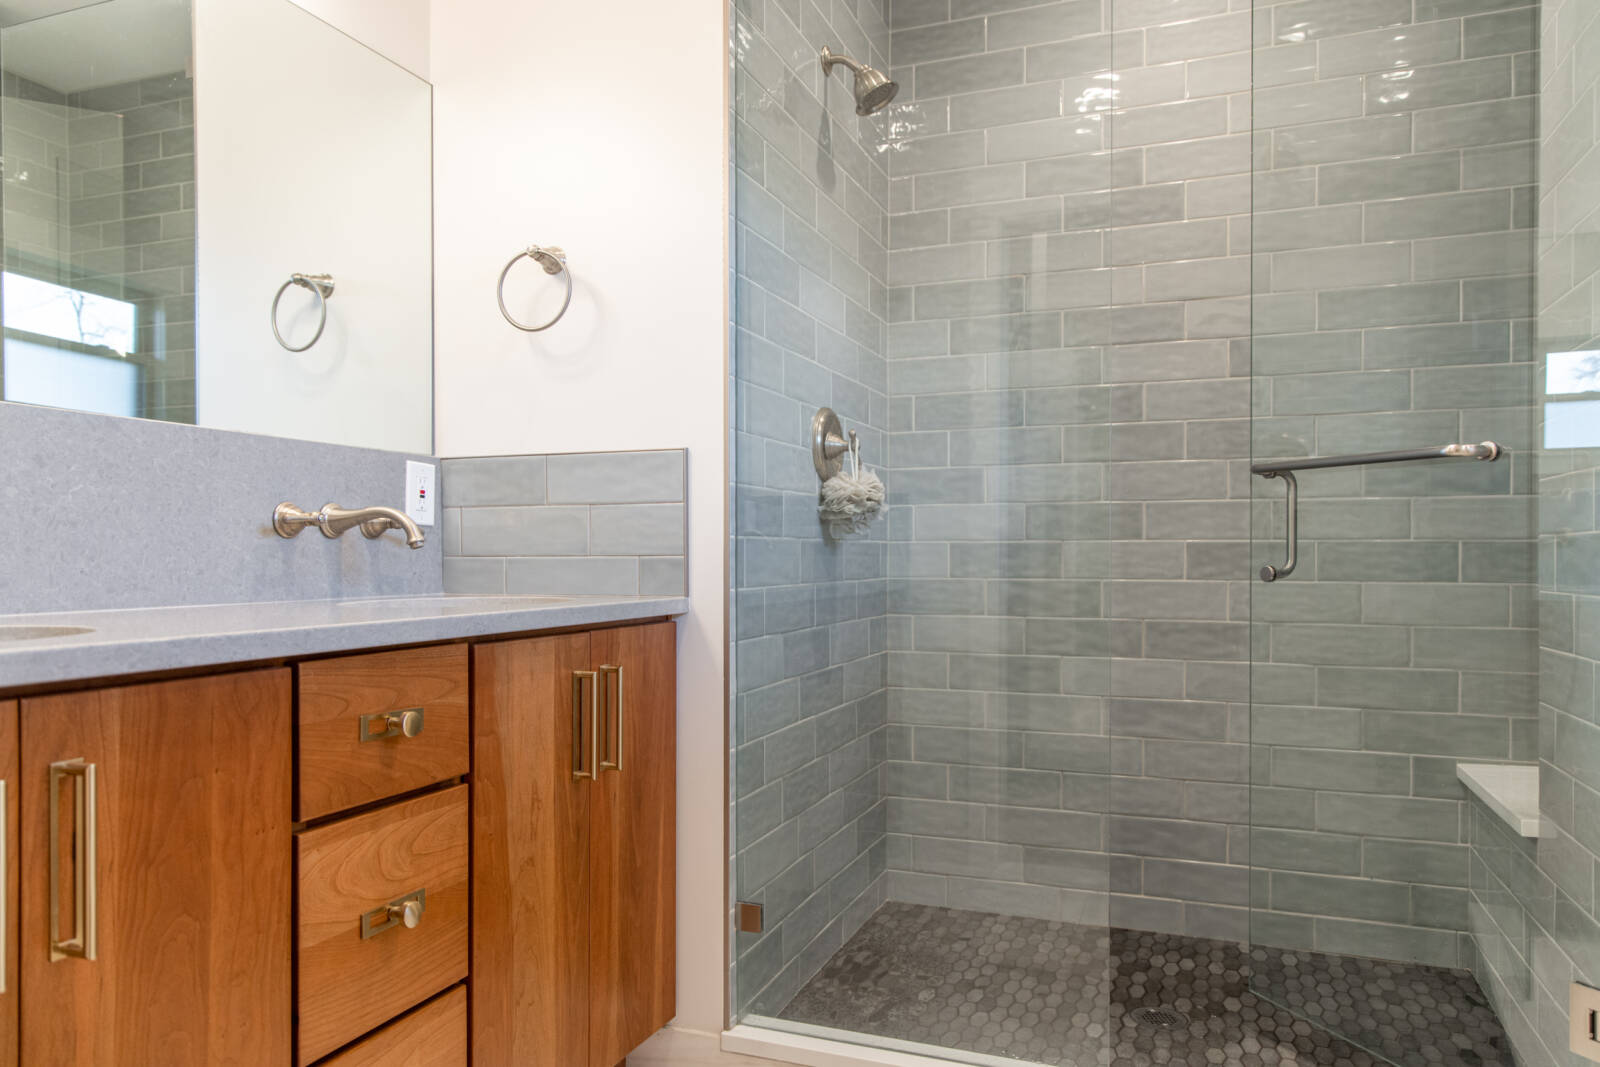 Modern Casual, Bathroom, showers, shower seat